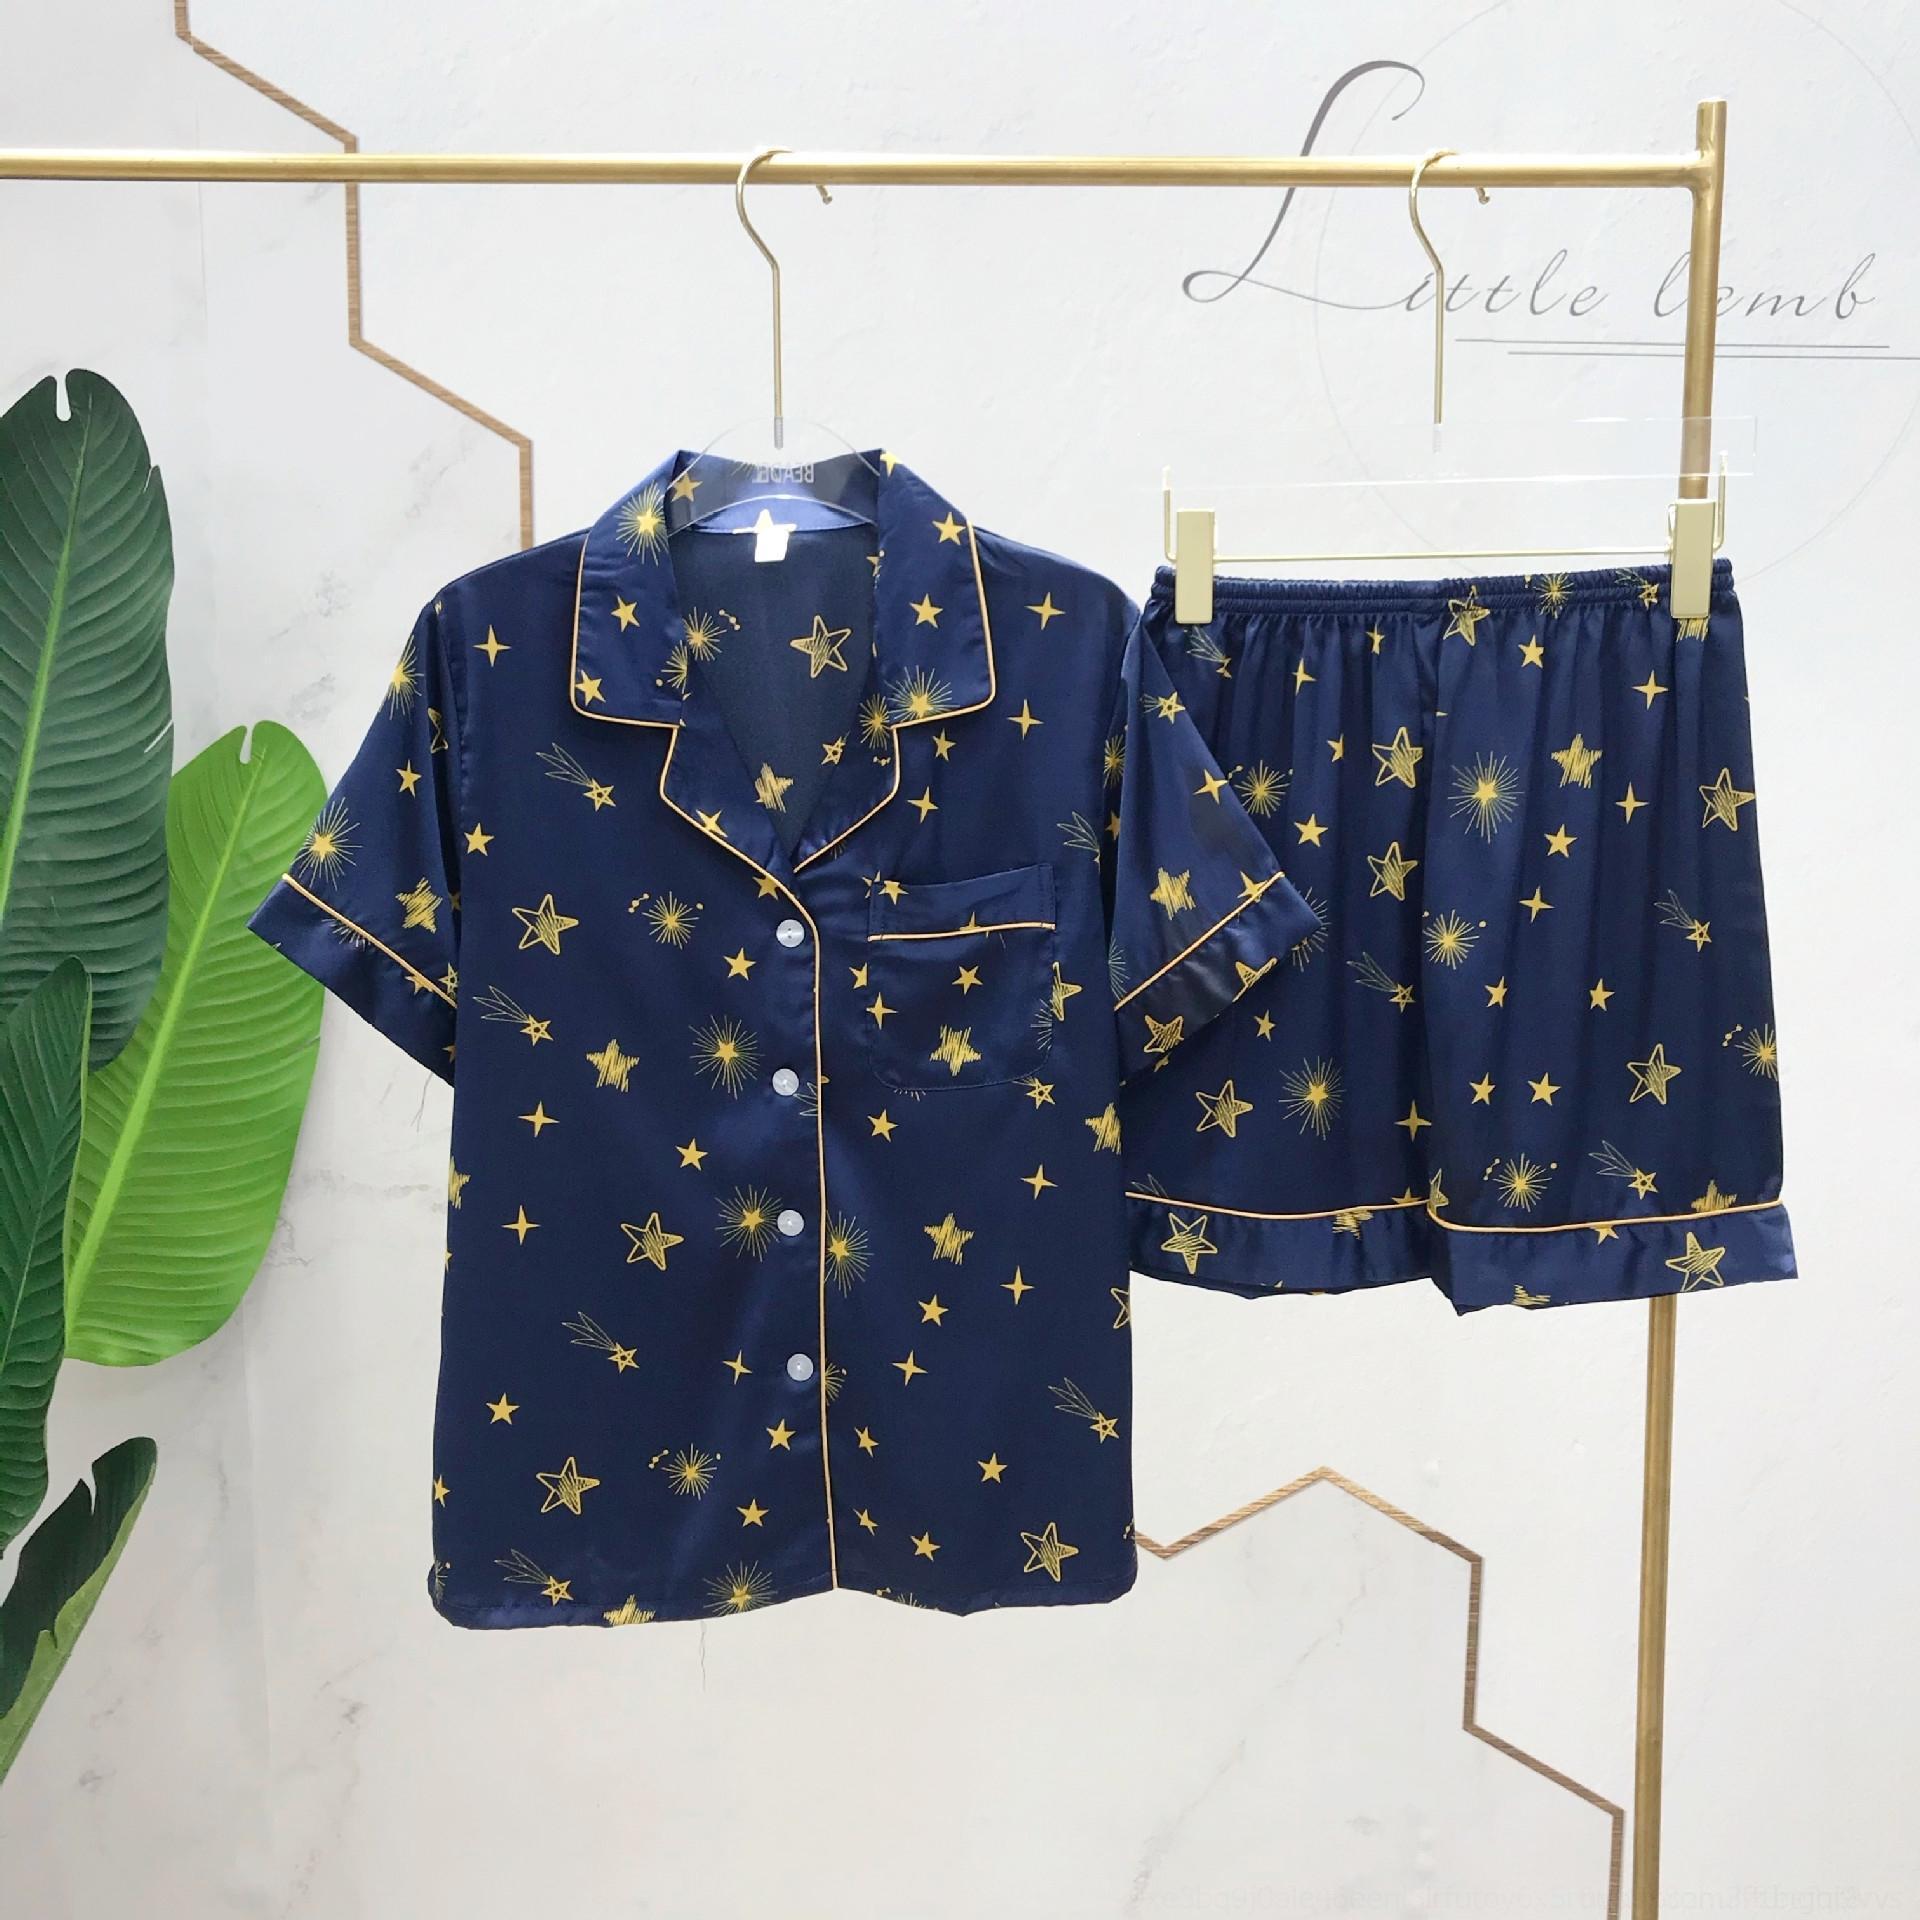 estilo pRKhl seda de gran tamaño pareja coreana c2FT4 ropa pijamas caseros ins estilo caseros de la ropa de manga corta de las mujeres impresas hielo informal de verano m